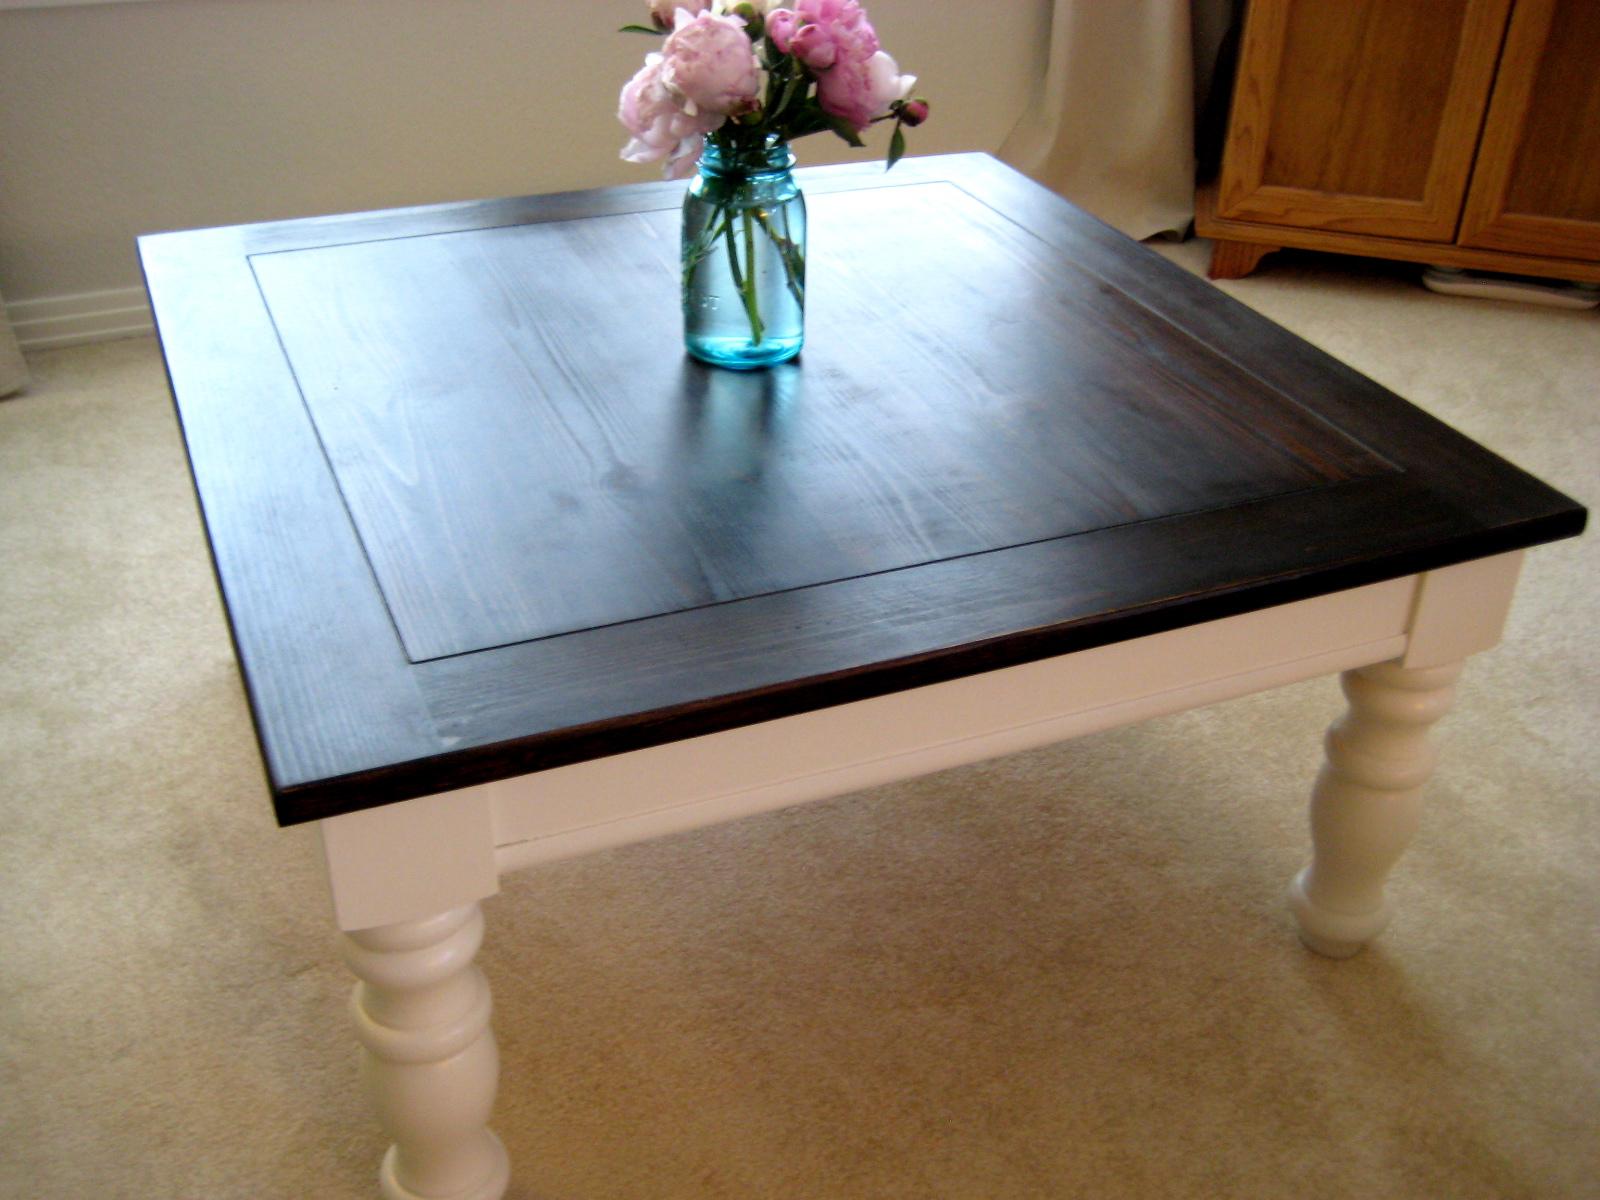 Handmade Homebody Coffee Tea Or Table - White coffee table with dark wood top